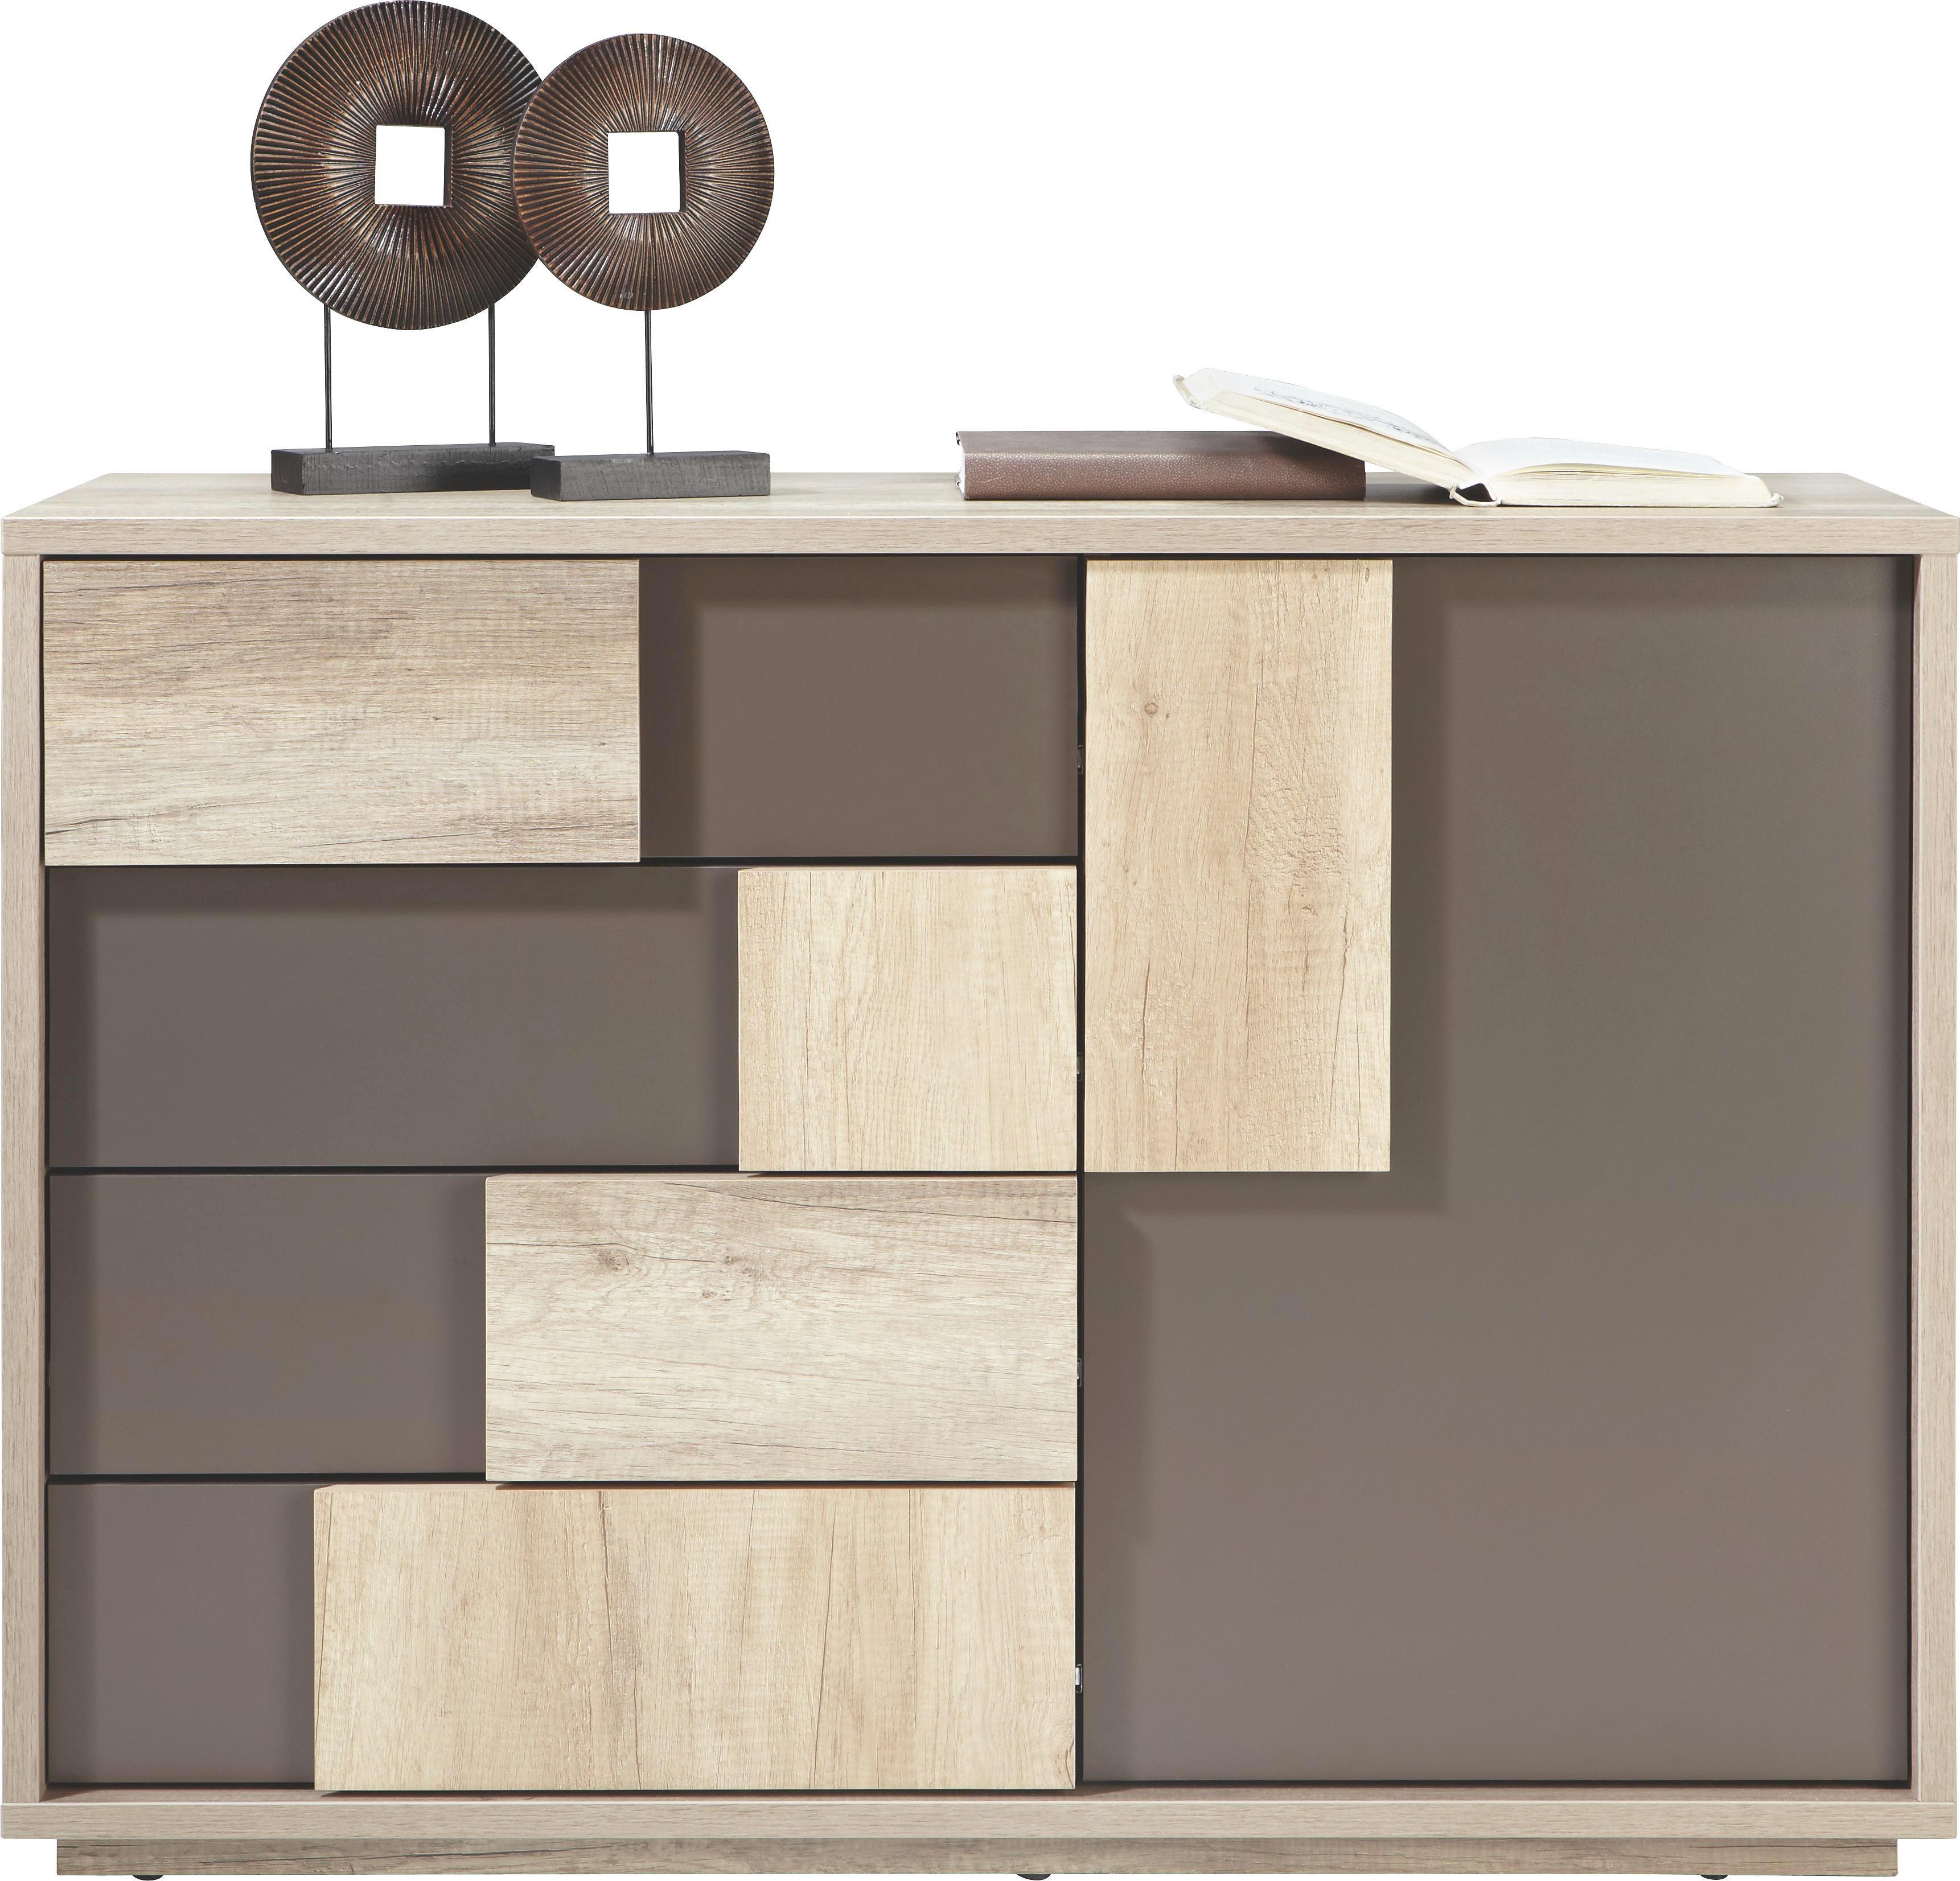 Kommode in Braun/Canyon Grey - Braun/Grau, MODERN, Holz (115/82/45cm) - MÖMAX modern living